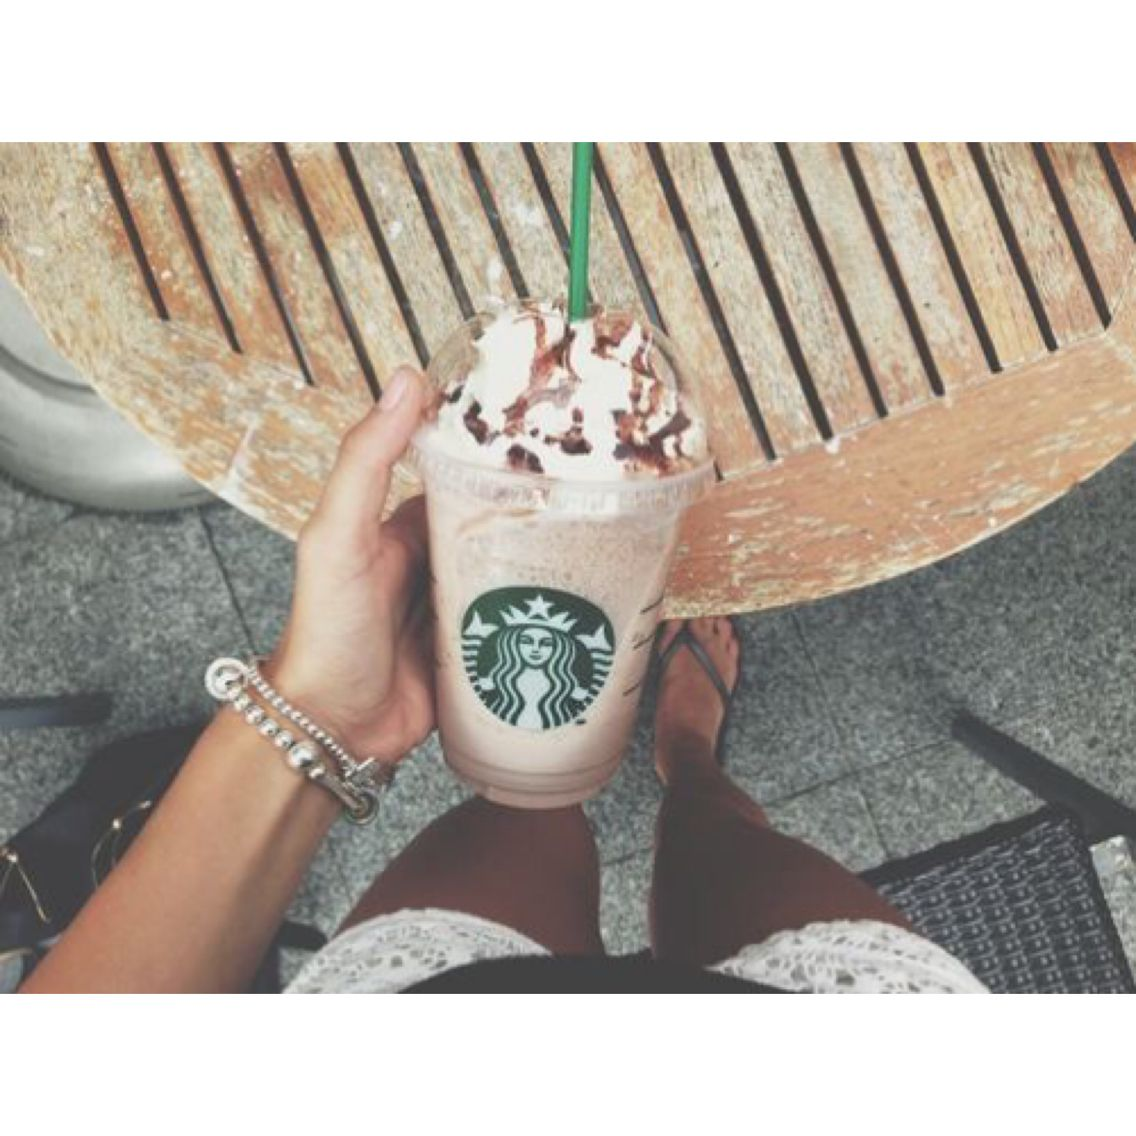 Pin by typical girl on starbucks Starbucks, Starbucks